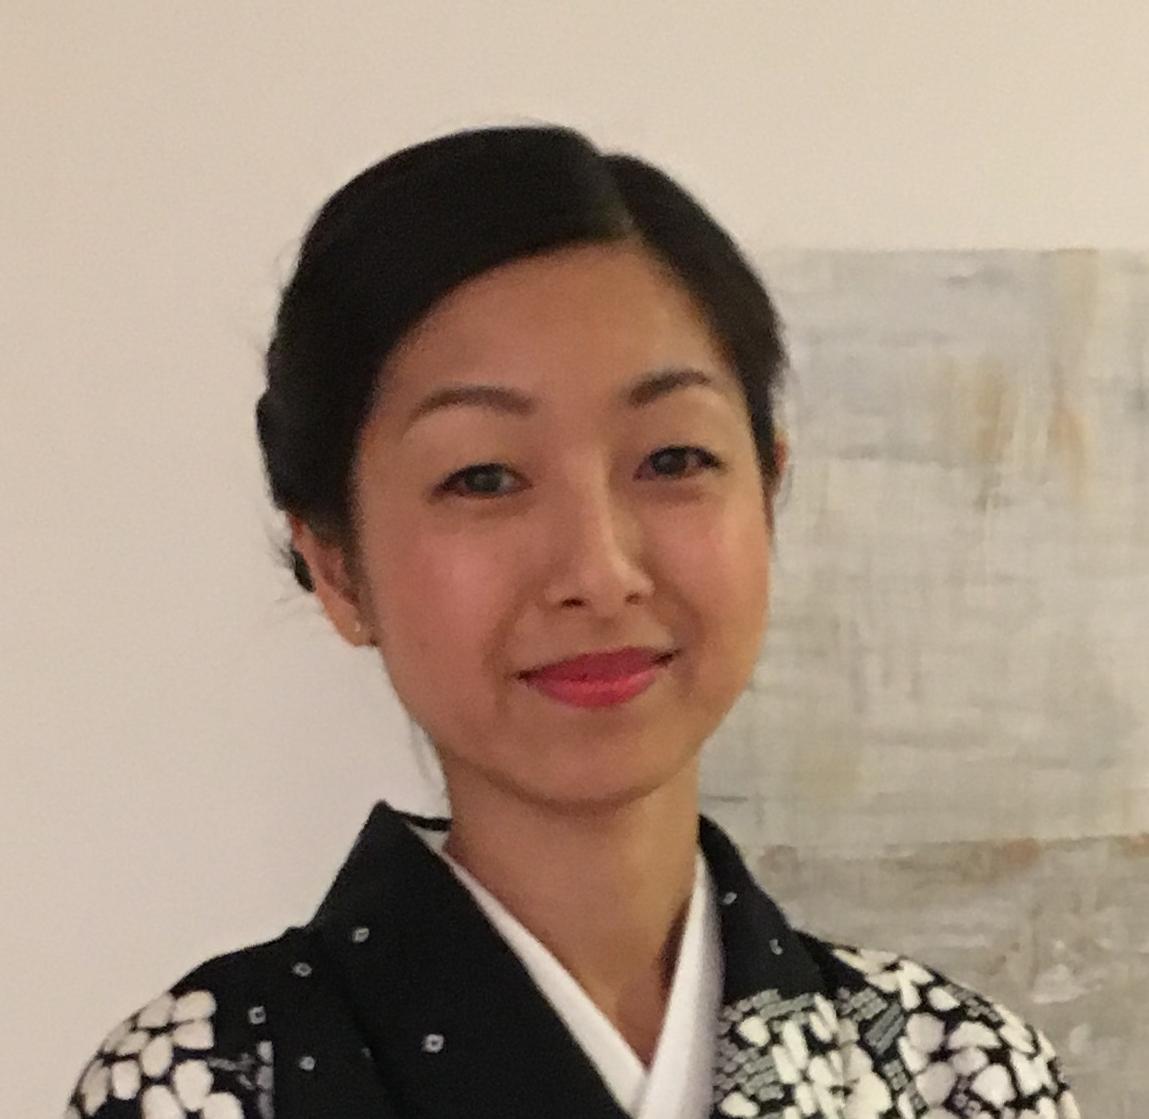 Hisayo Katsui